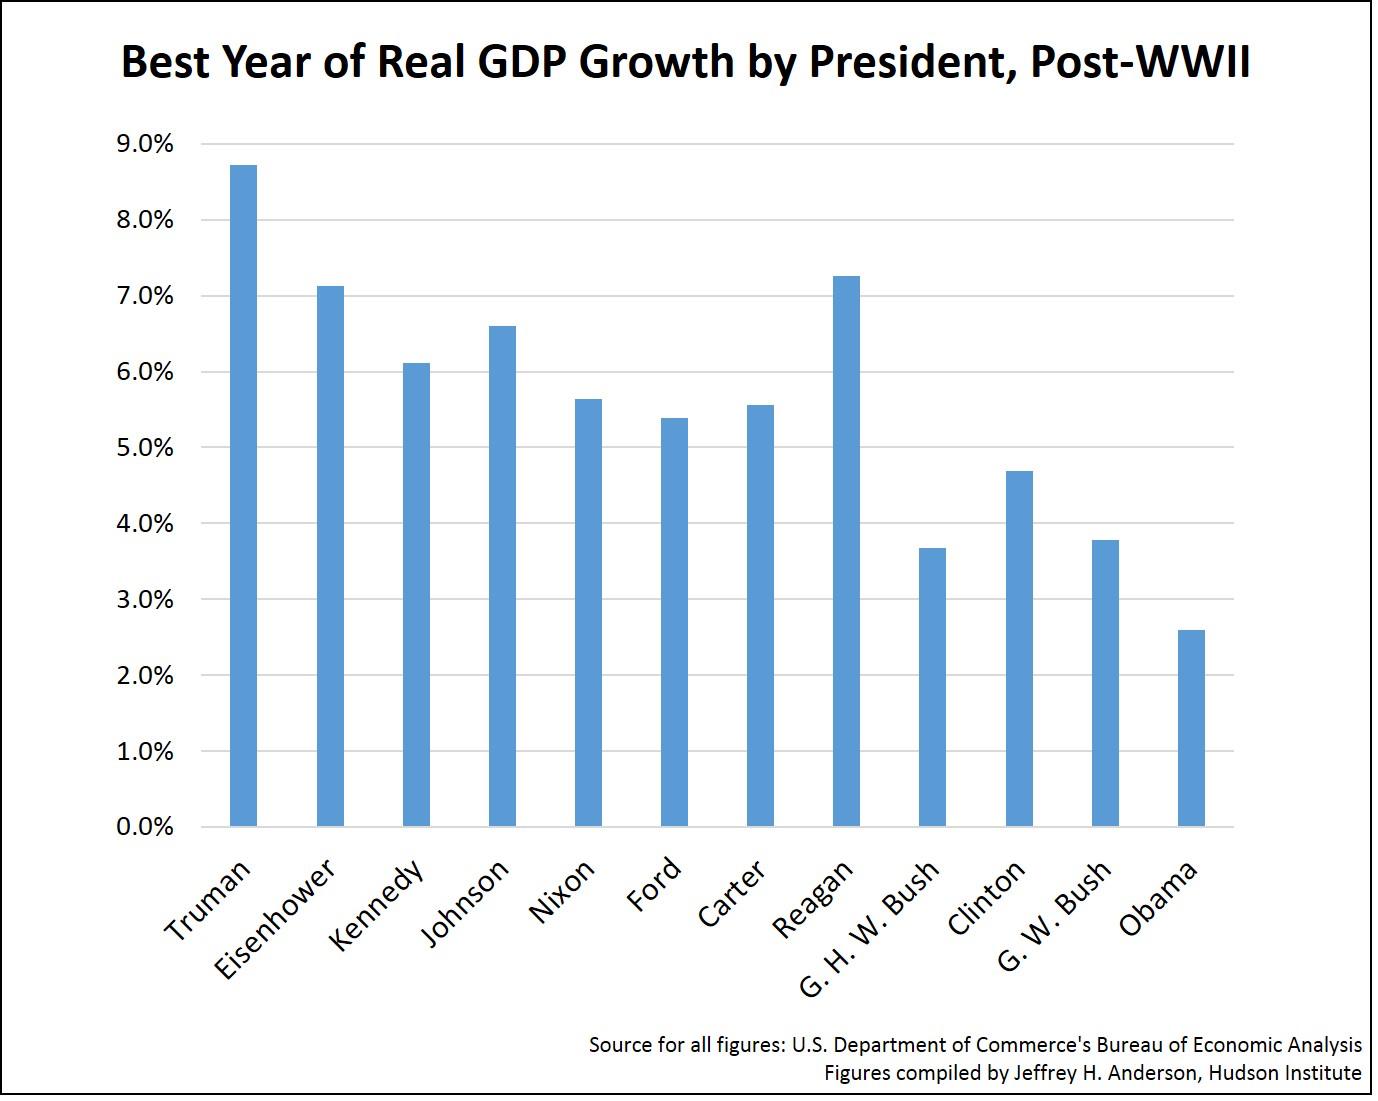 GDP single year growth